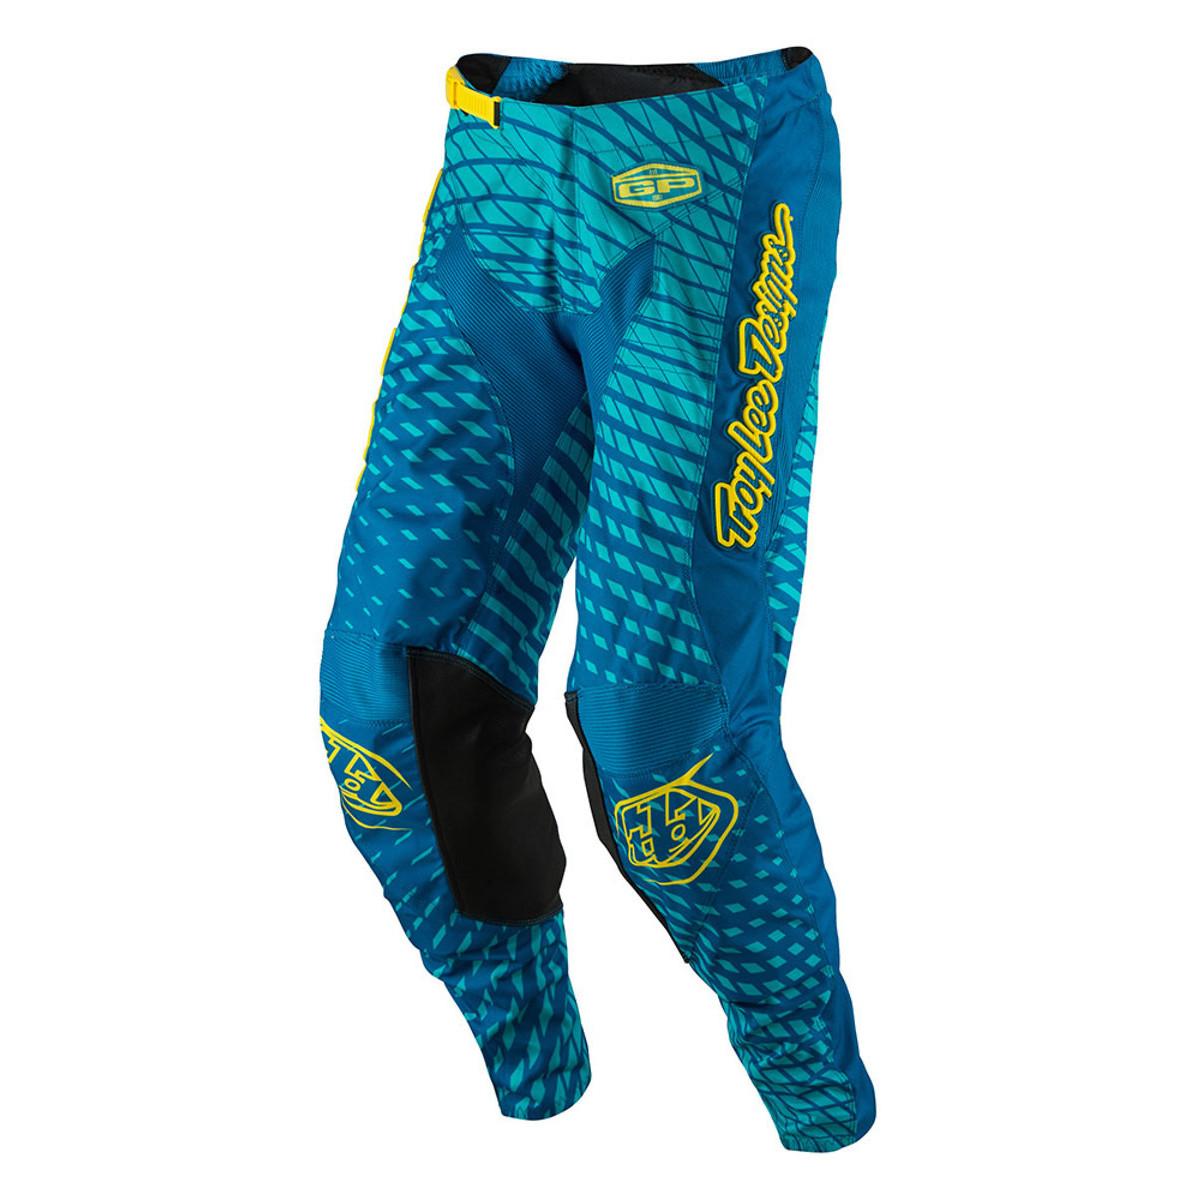 TLD GP Moto Pants - Tremor Blue:Yellow